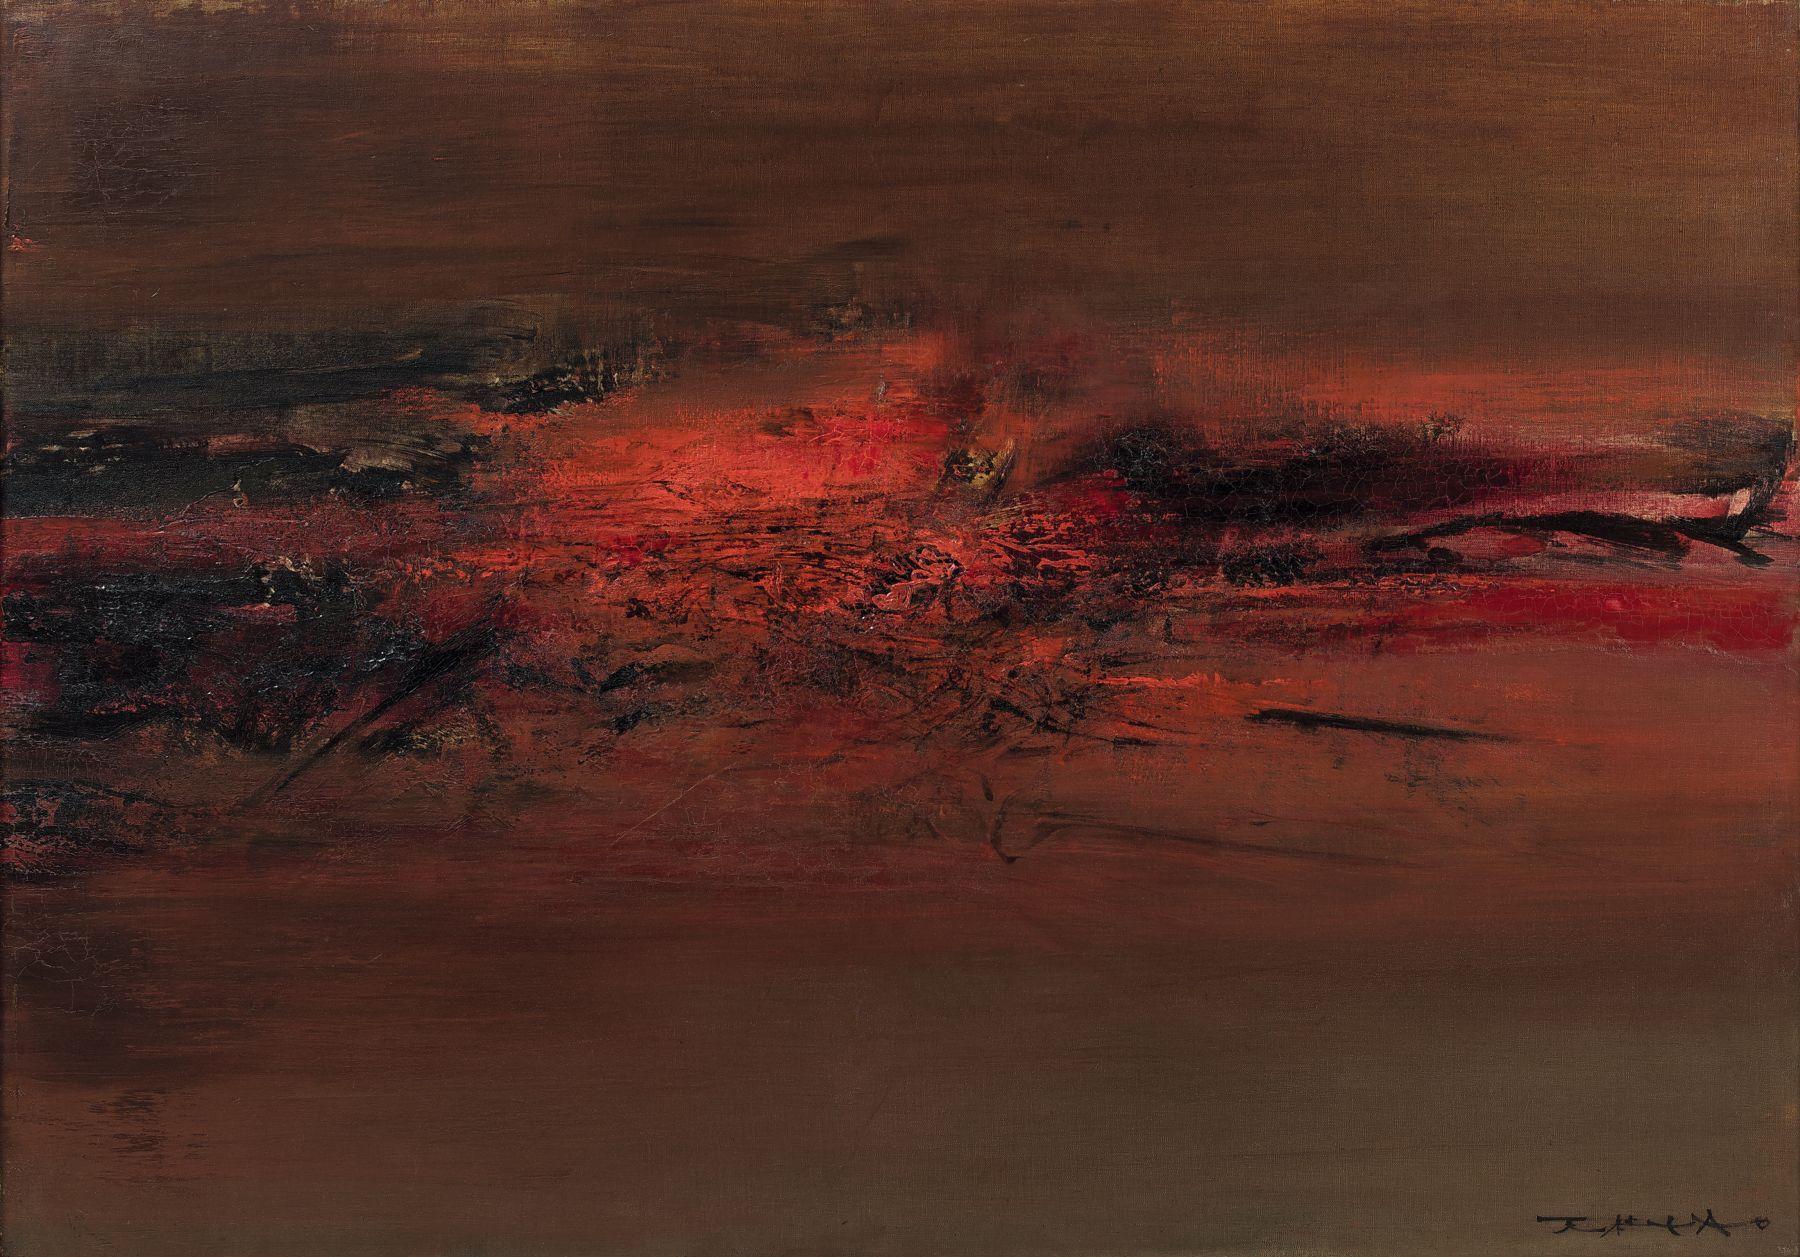 Zao Wou-Ki 14.05.62, 1962 Huile sur toile